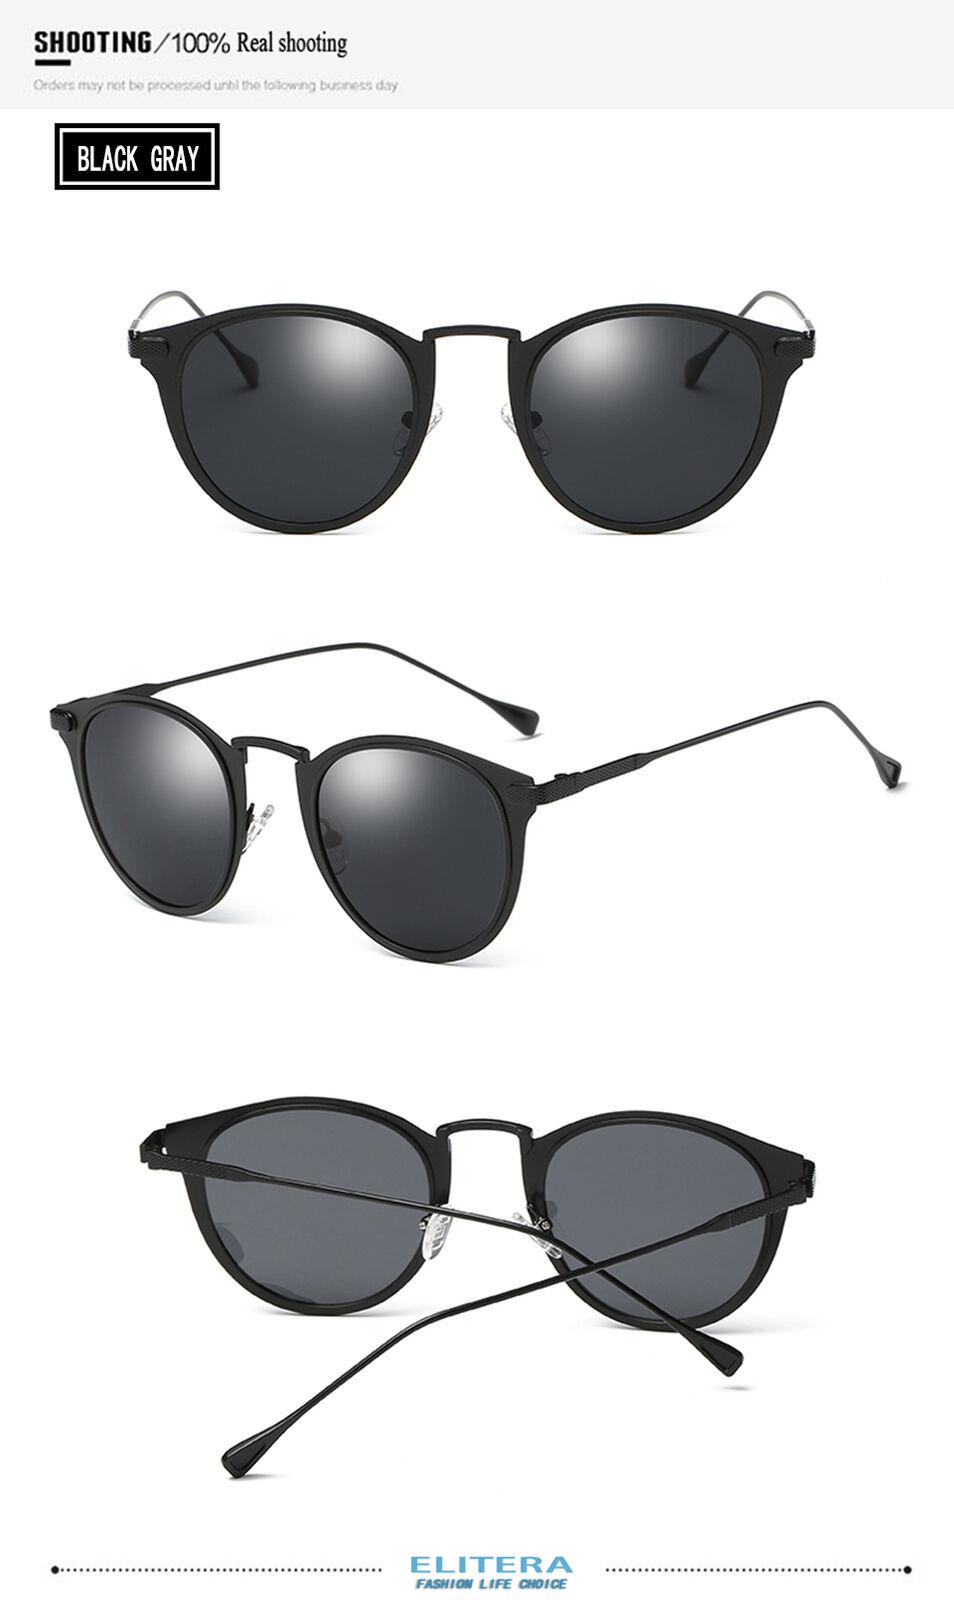 ELITERA New Womens Fashion Design Polarized Sunglasses Shades Butterfly Glasses